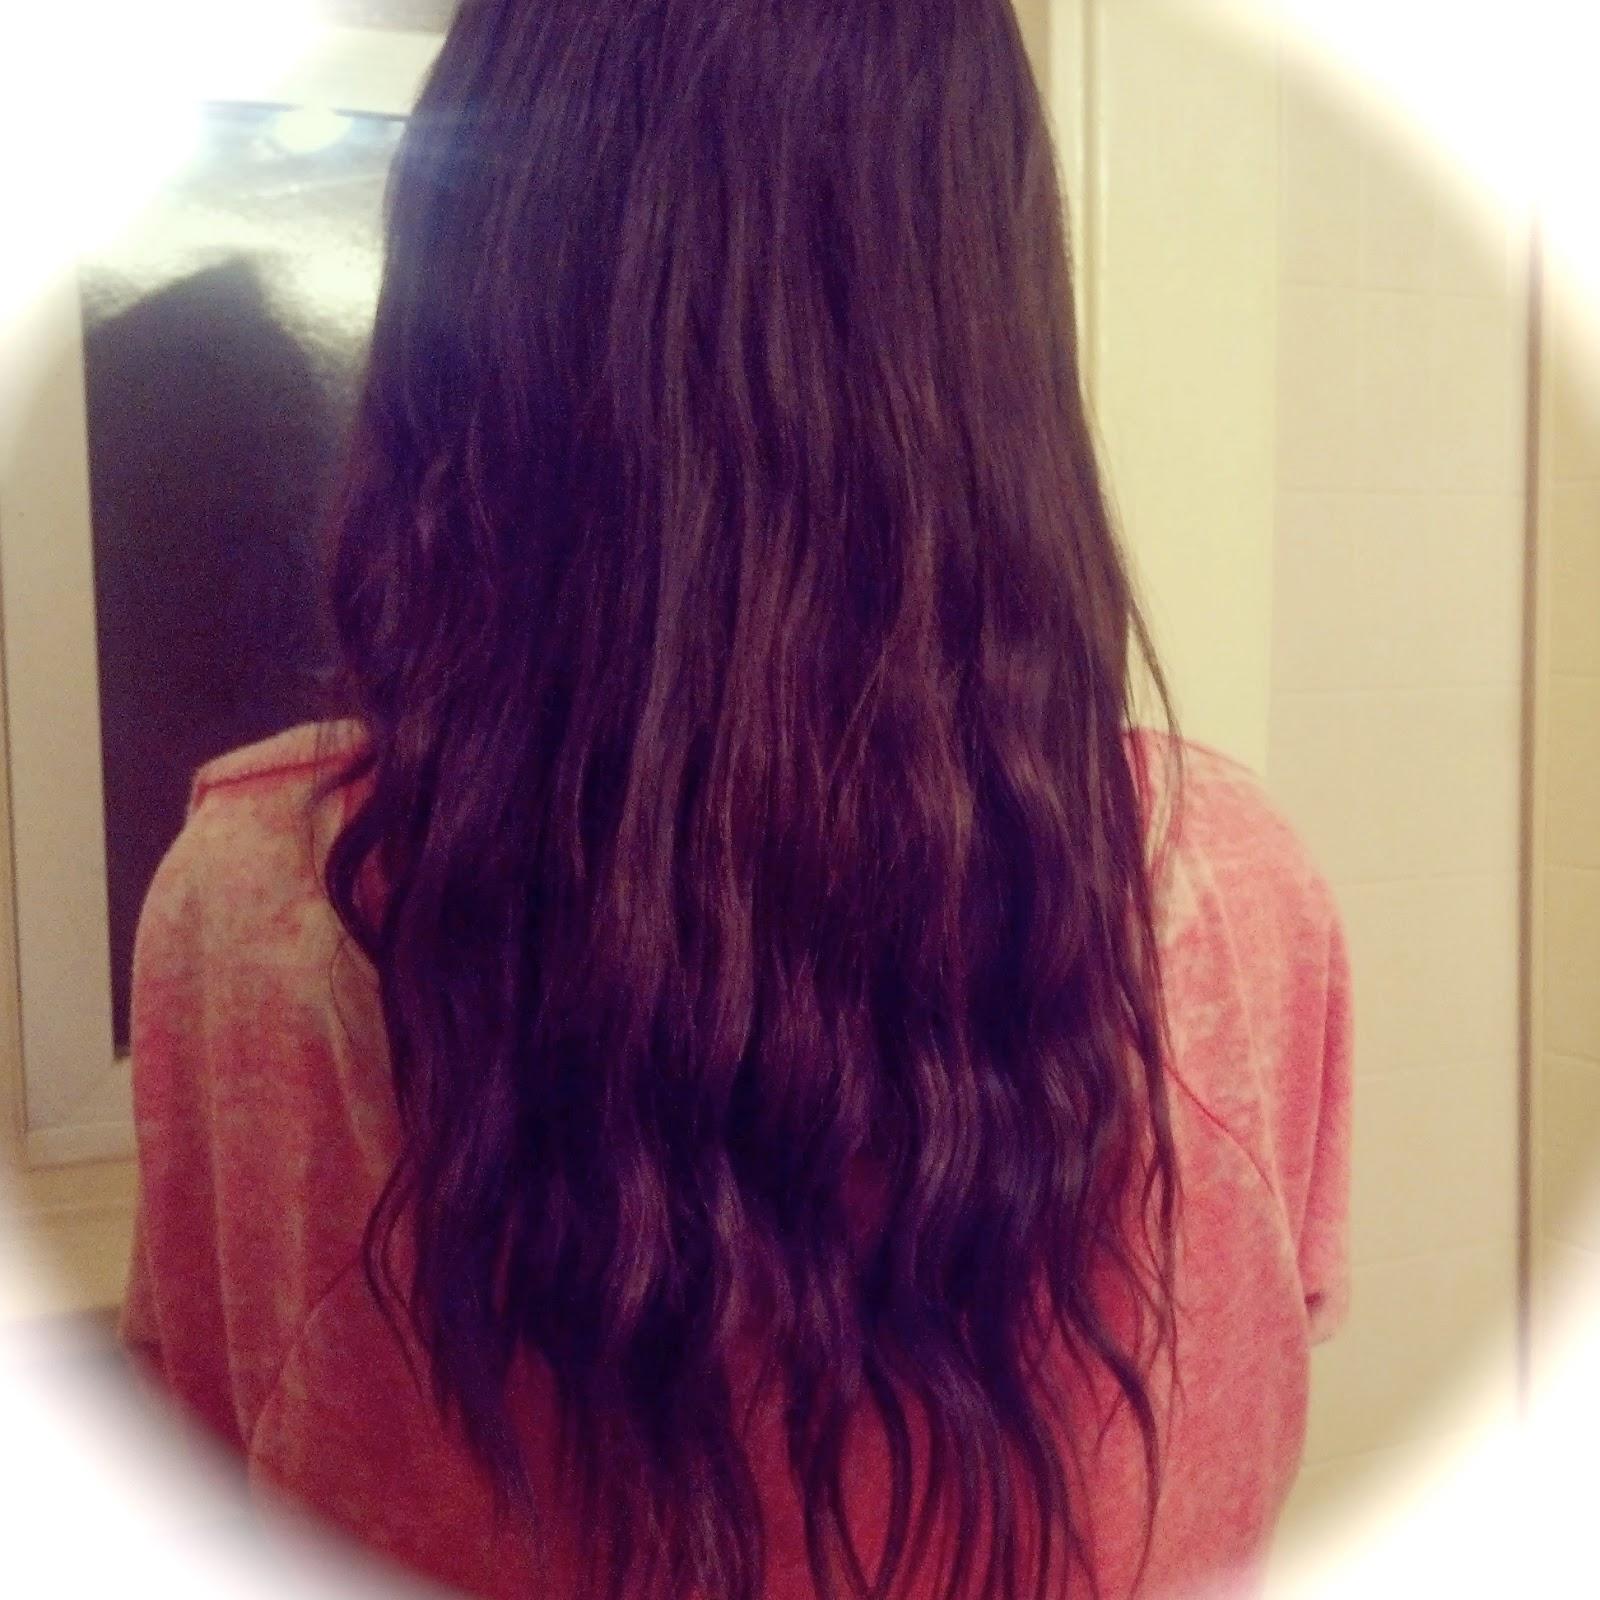 Catastrophe Cosmetic Lush Caca Brun Henna Hair Color Tutorial